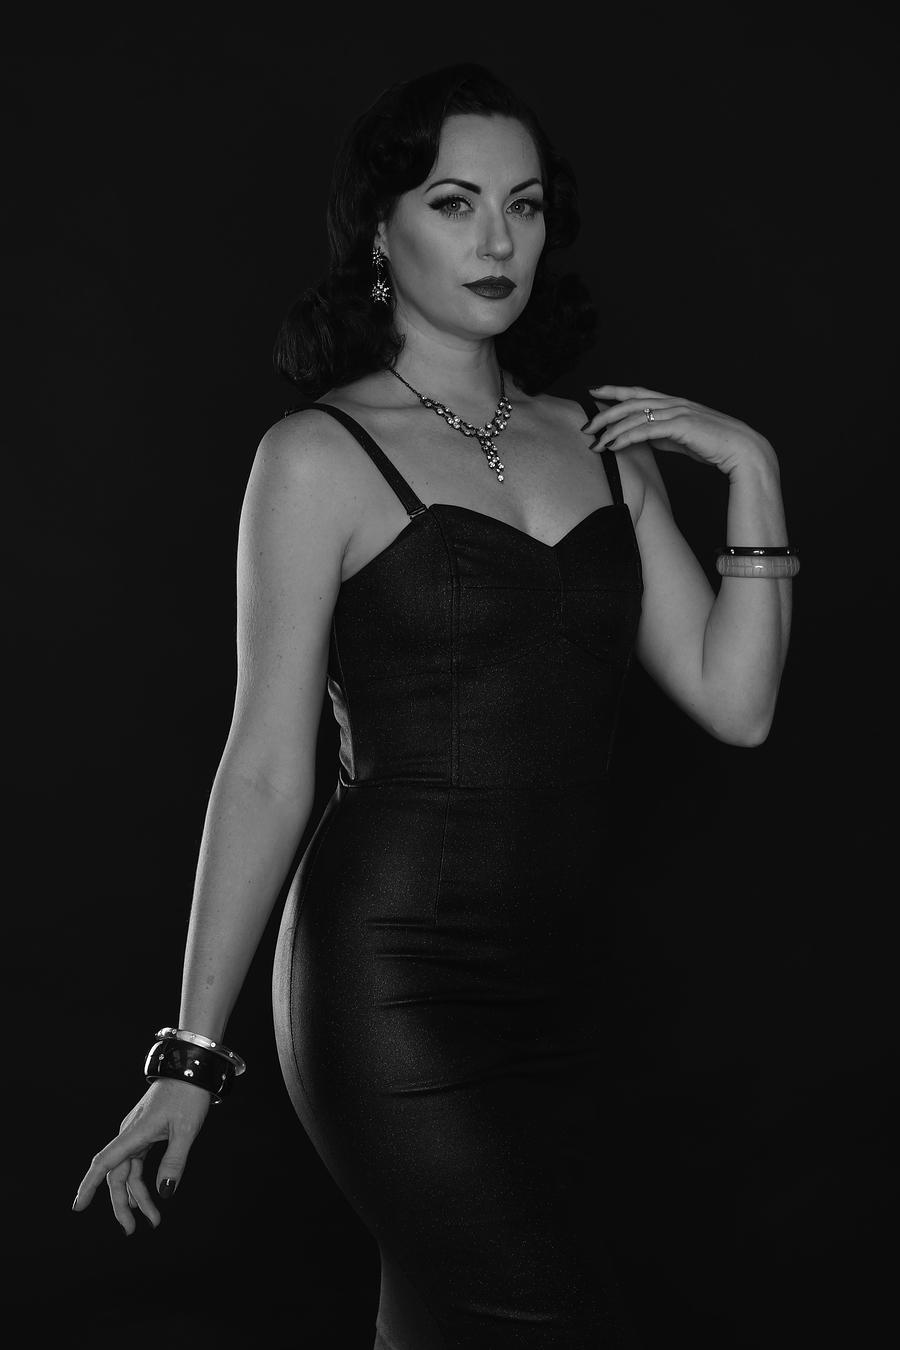 Elegant pose / Photography by Inspire Studios Ltd, Model MissPearlCurl, Taken at Inspire Studios Ltd / Uploaded 21st October 2018 @ 09:44 AM